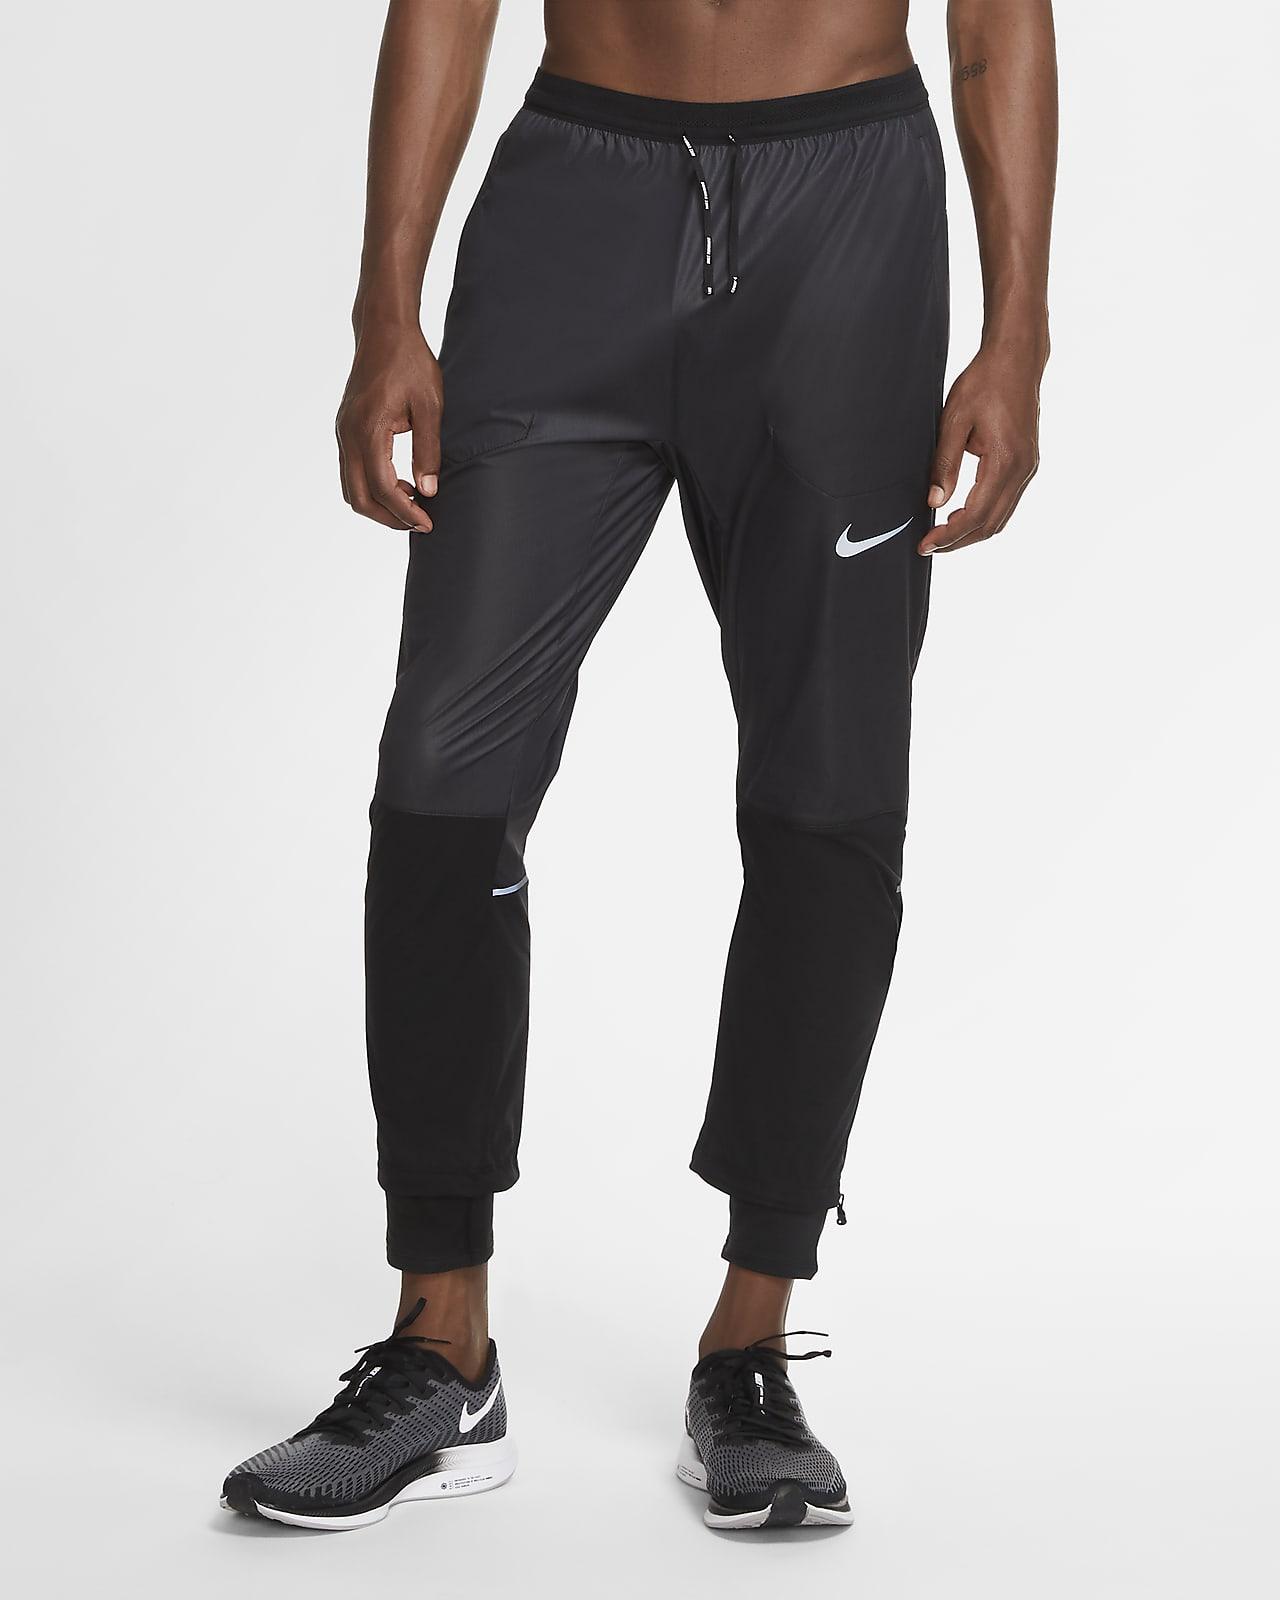 Calças de running Nike Swift Shield para homem